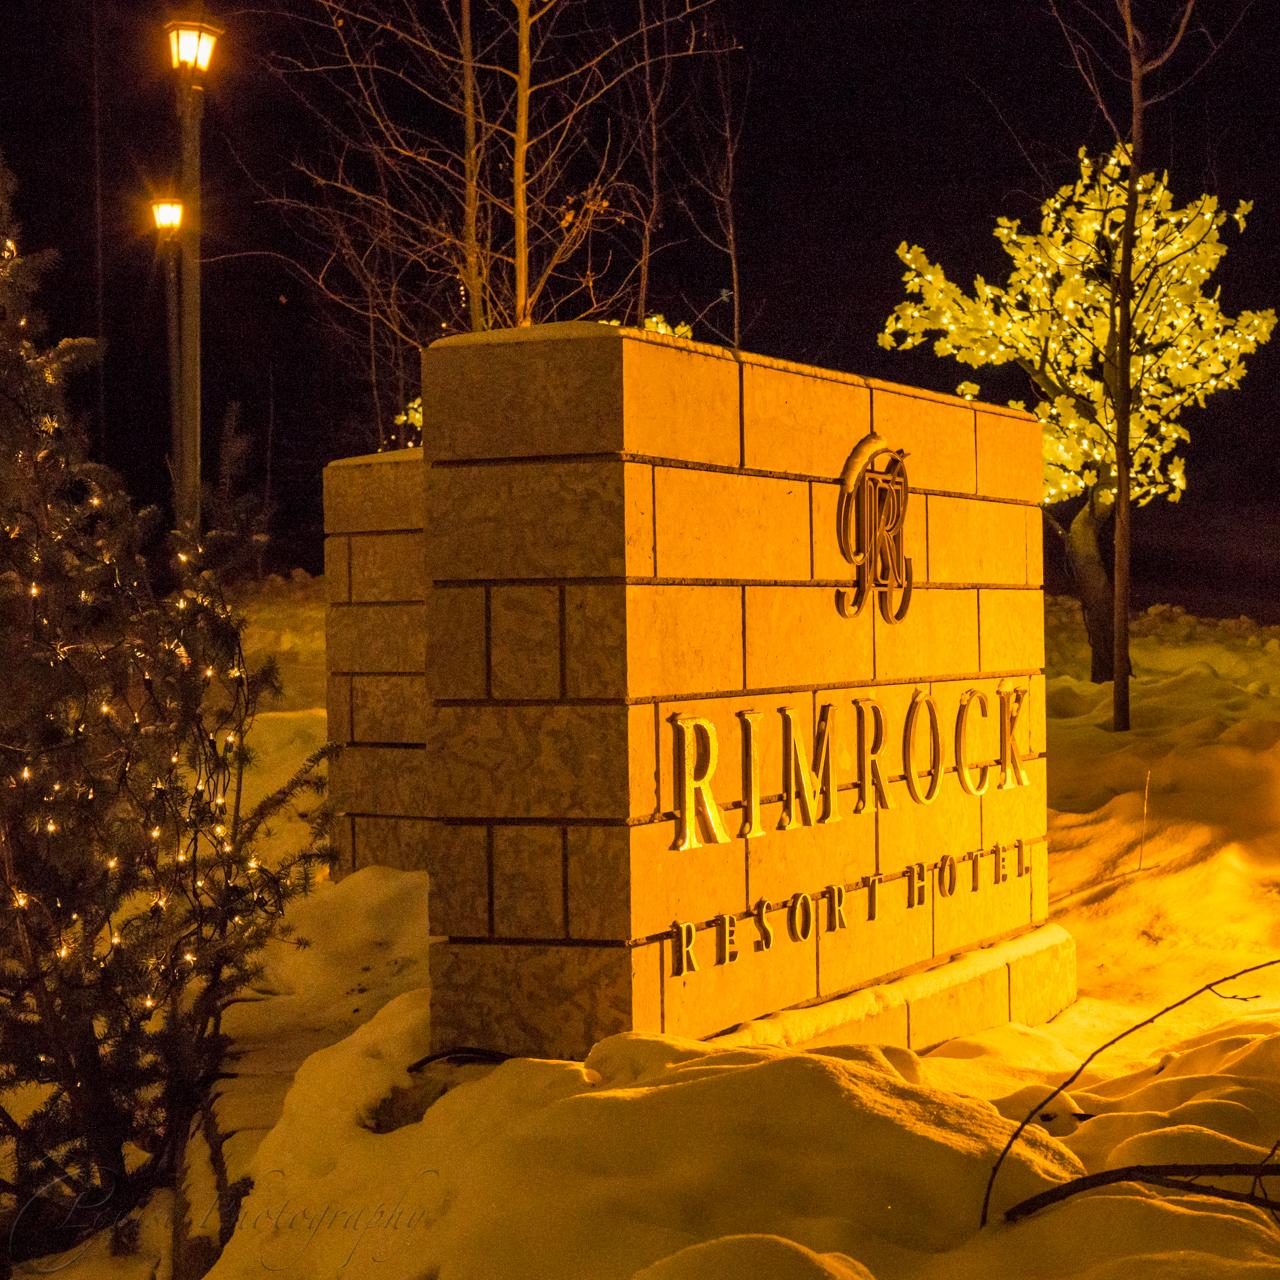 Clouise-14014-December 28 2014 & Christmas Magic at The Rimrock Resort Hotel Banff   A Yorkshire ... azcodes.com